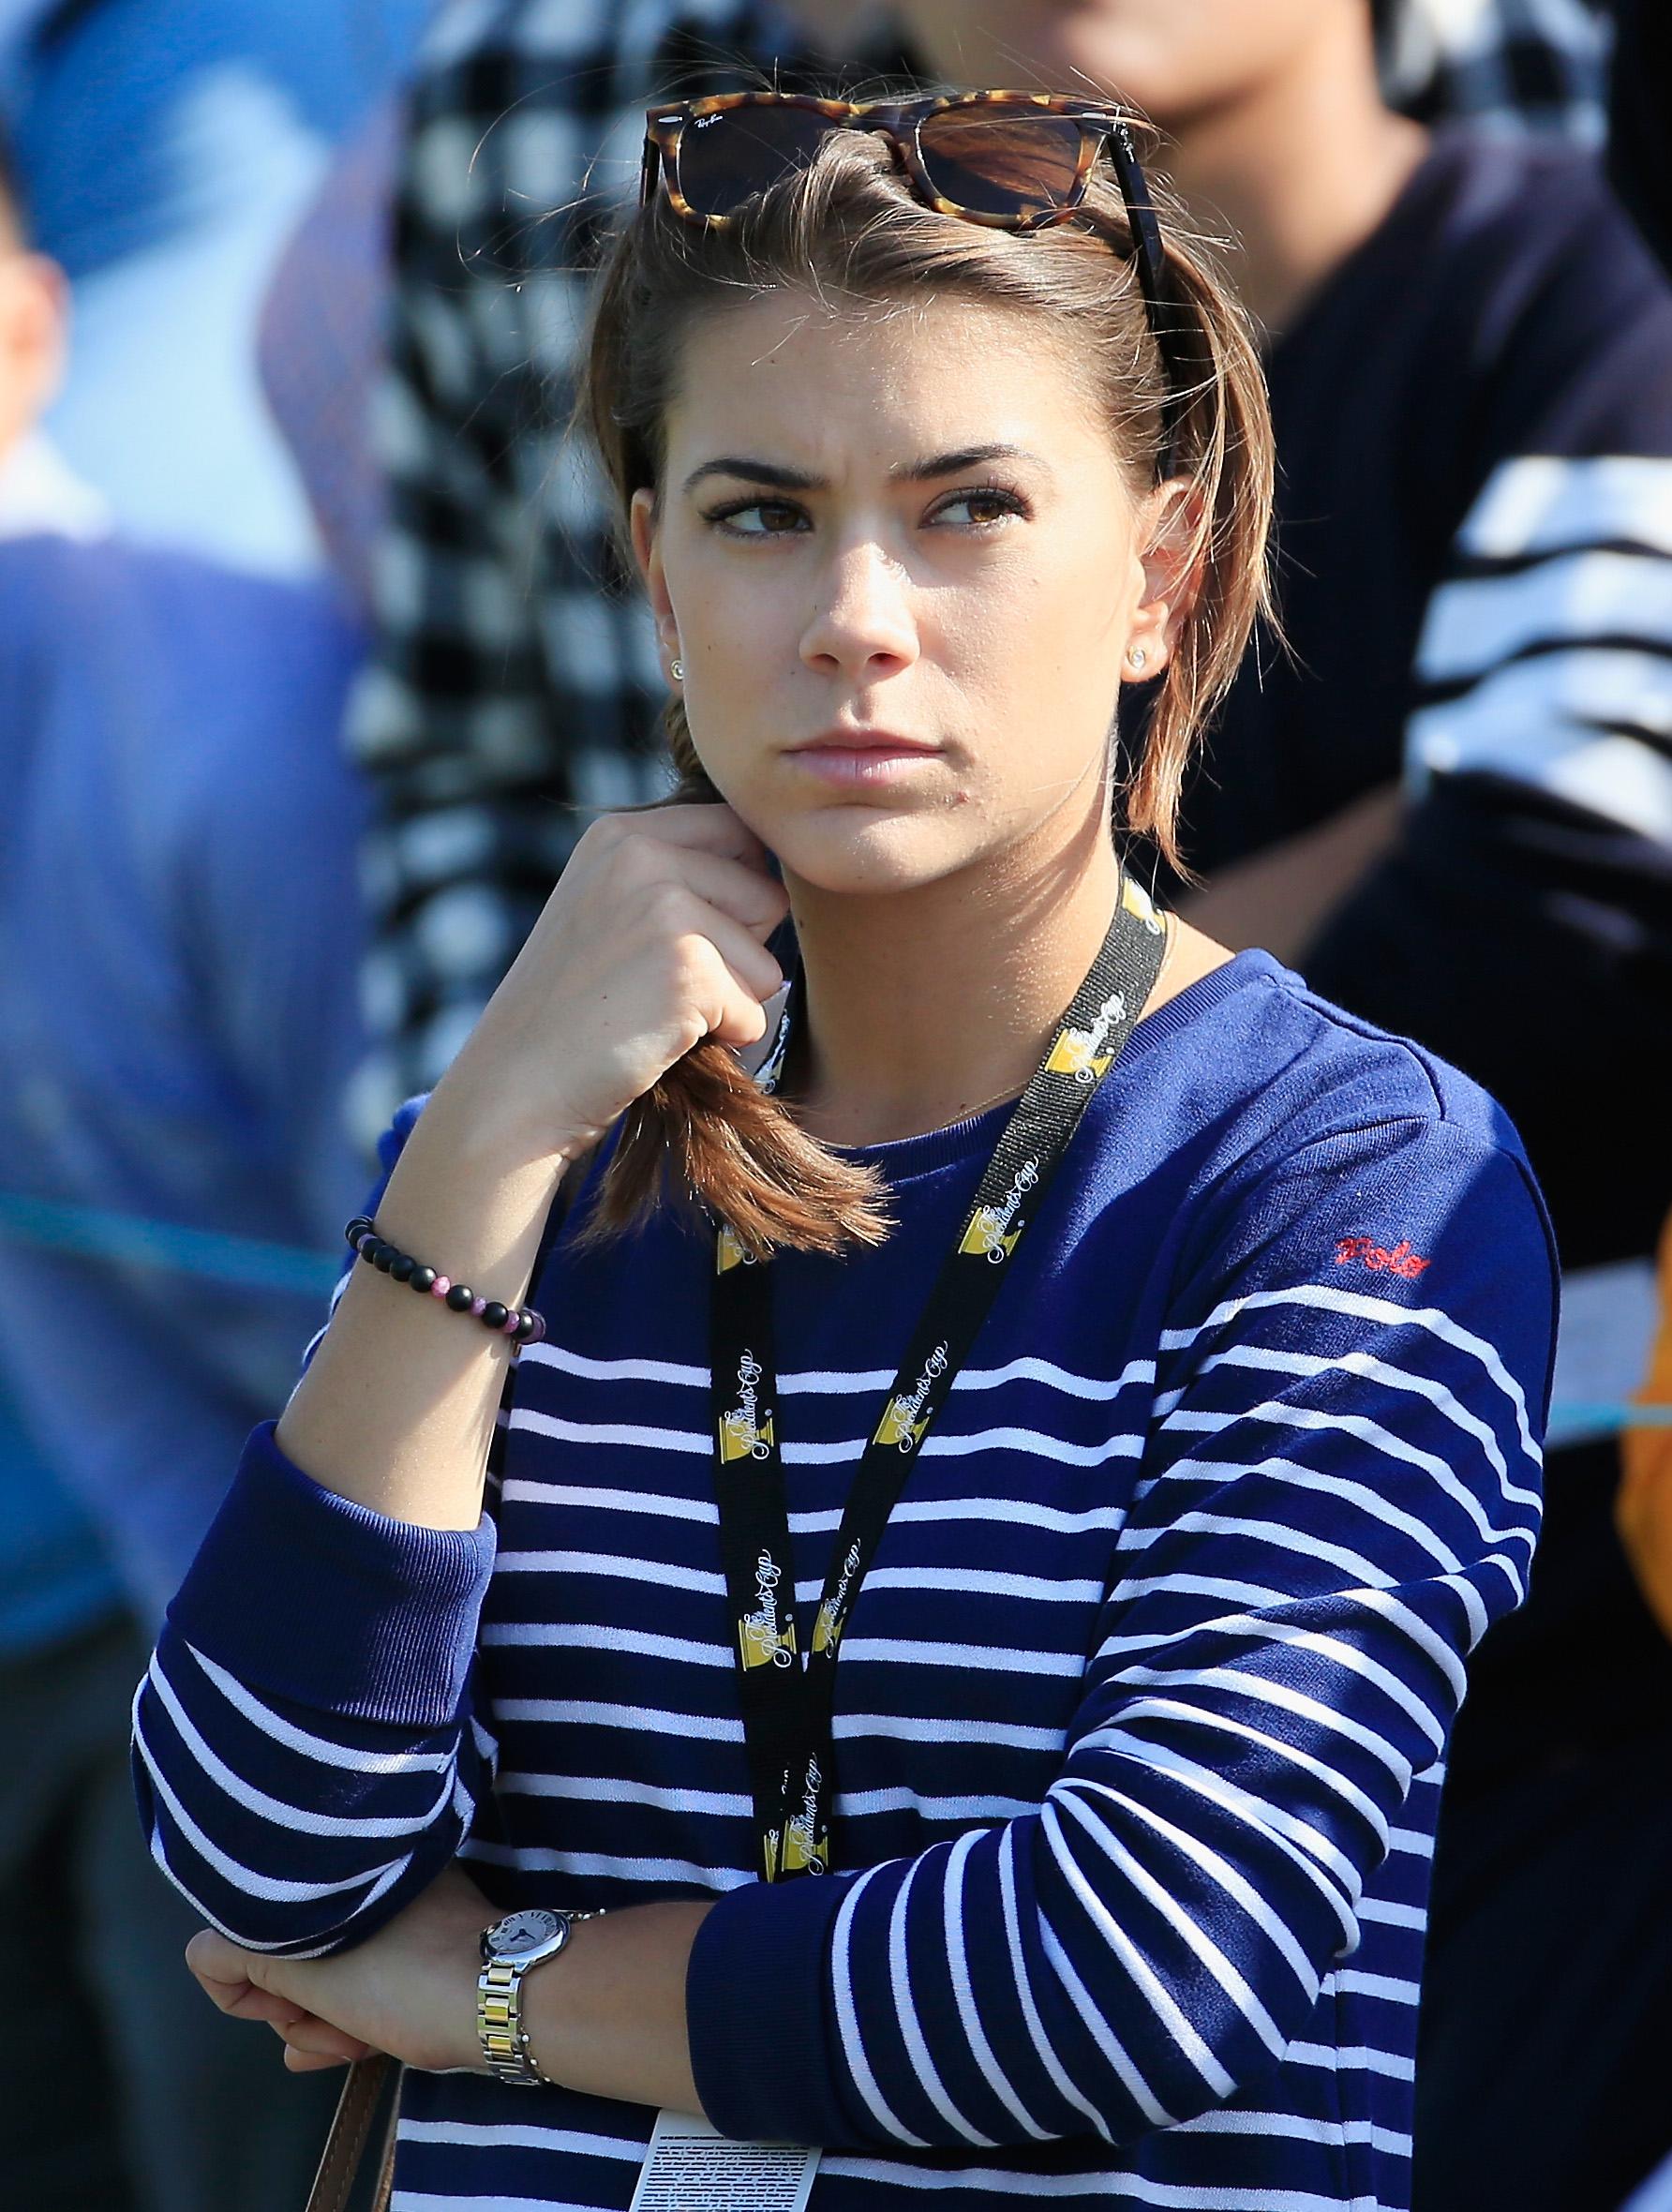 Annie Verret is a regular watching partner Jordan Speith in the majors